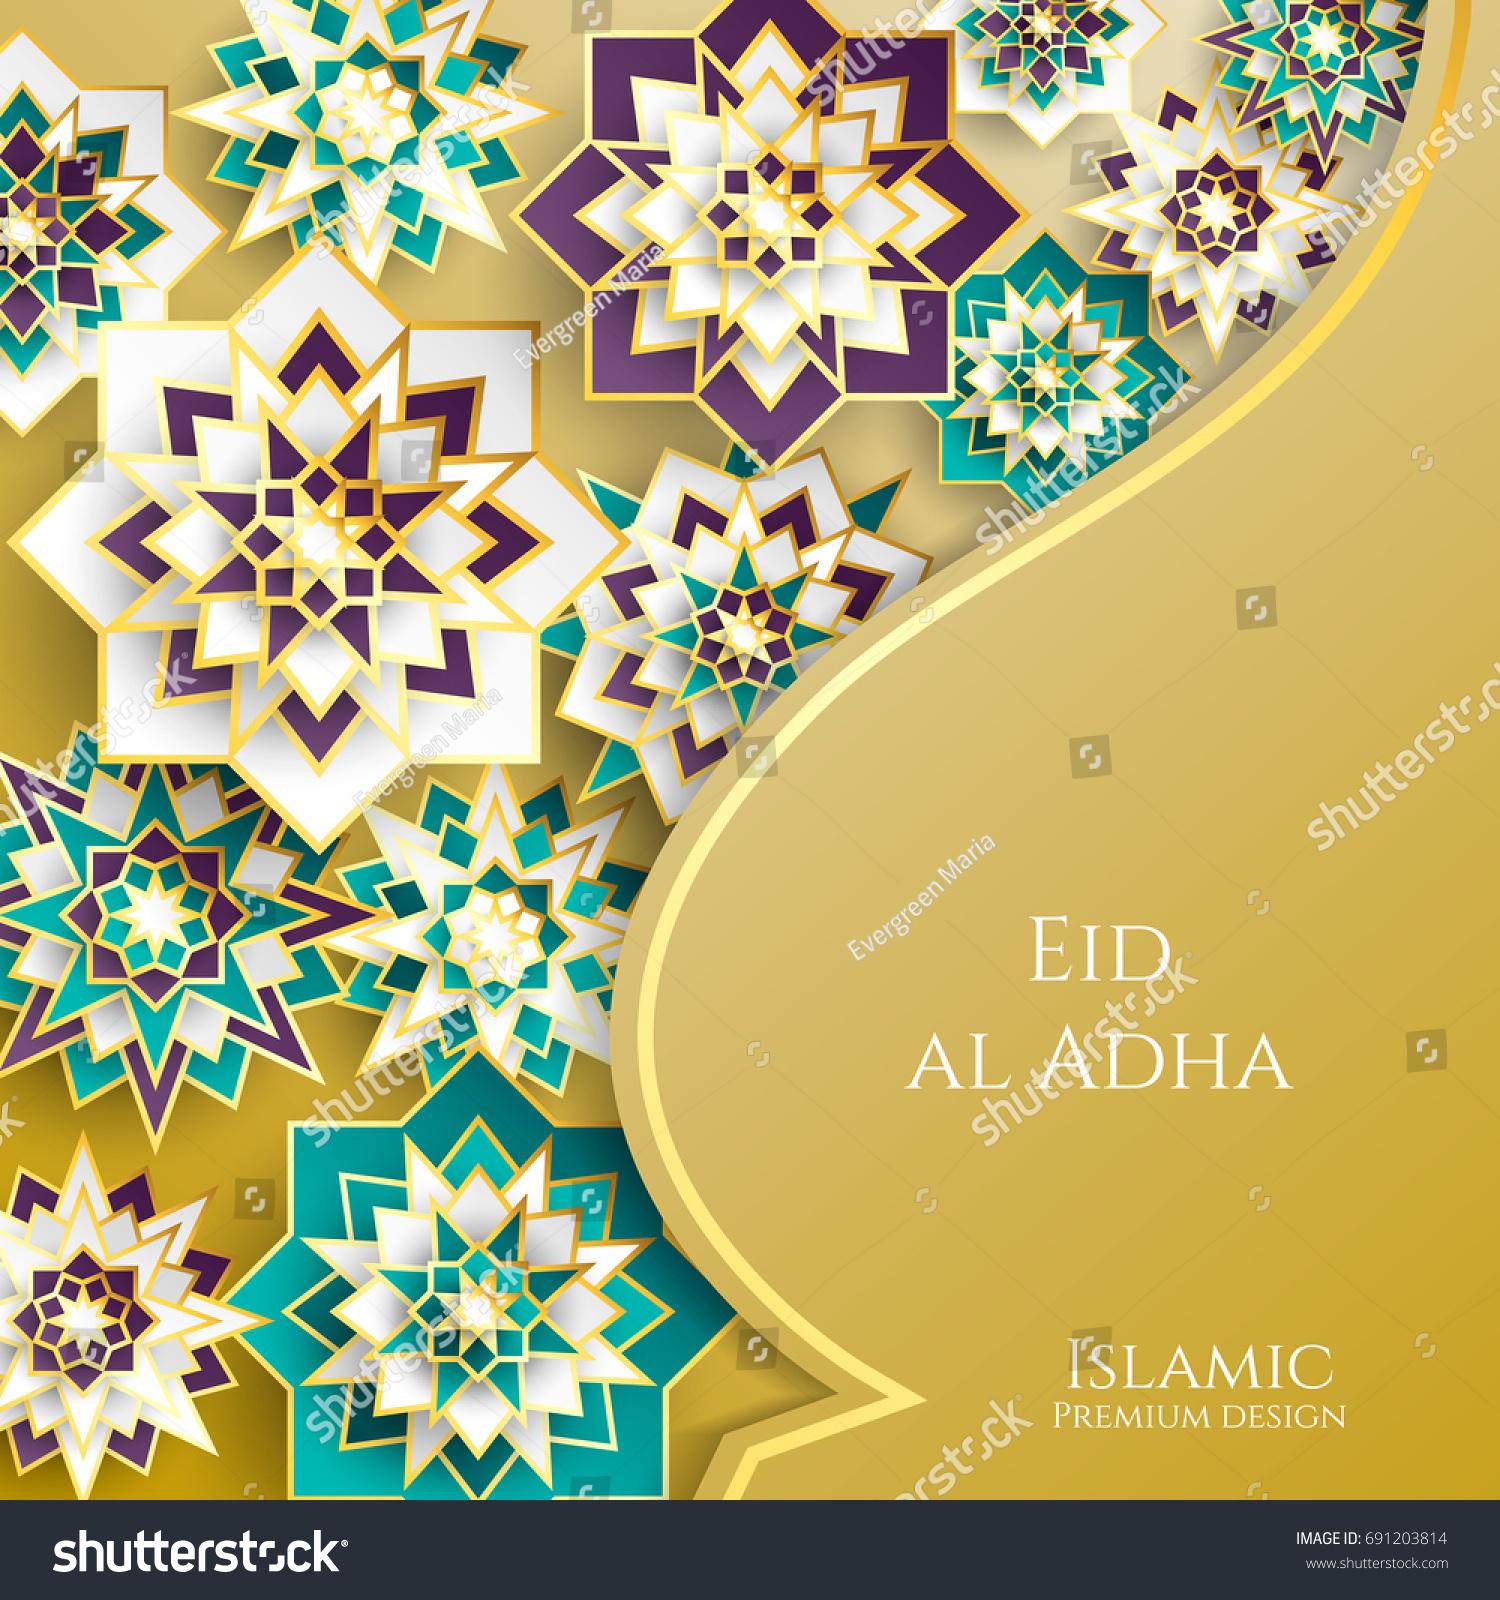 muslim community festival eid al adha stock vector 691203814